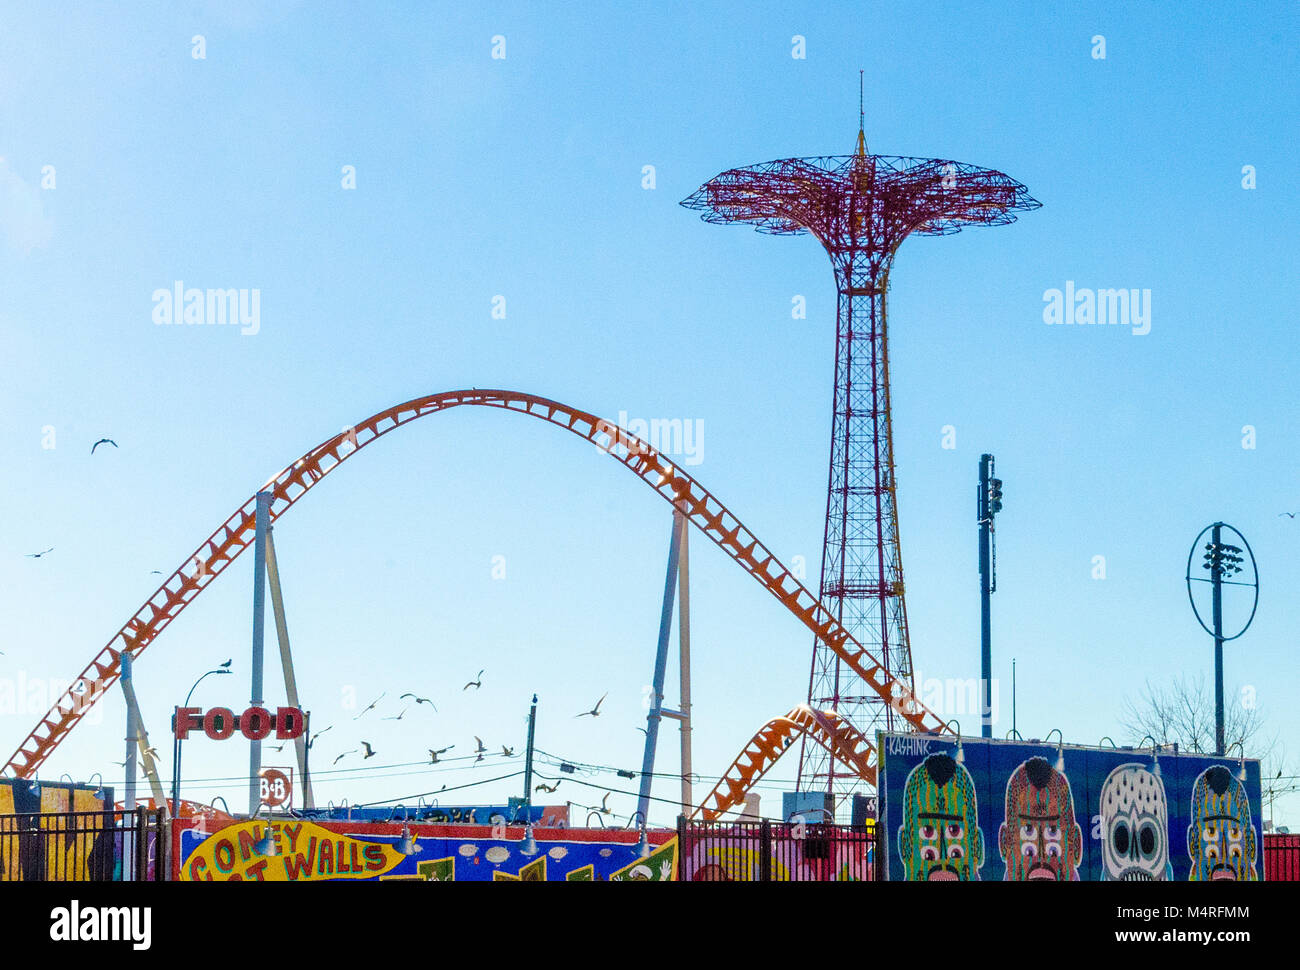 Coney Island Old Rides, New York USA Stock Photo: 175079540 - Alamy